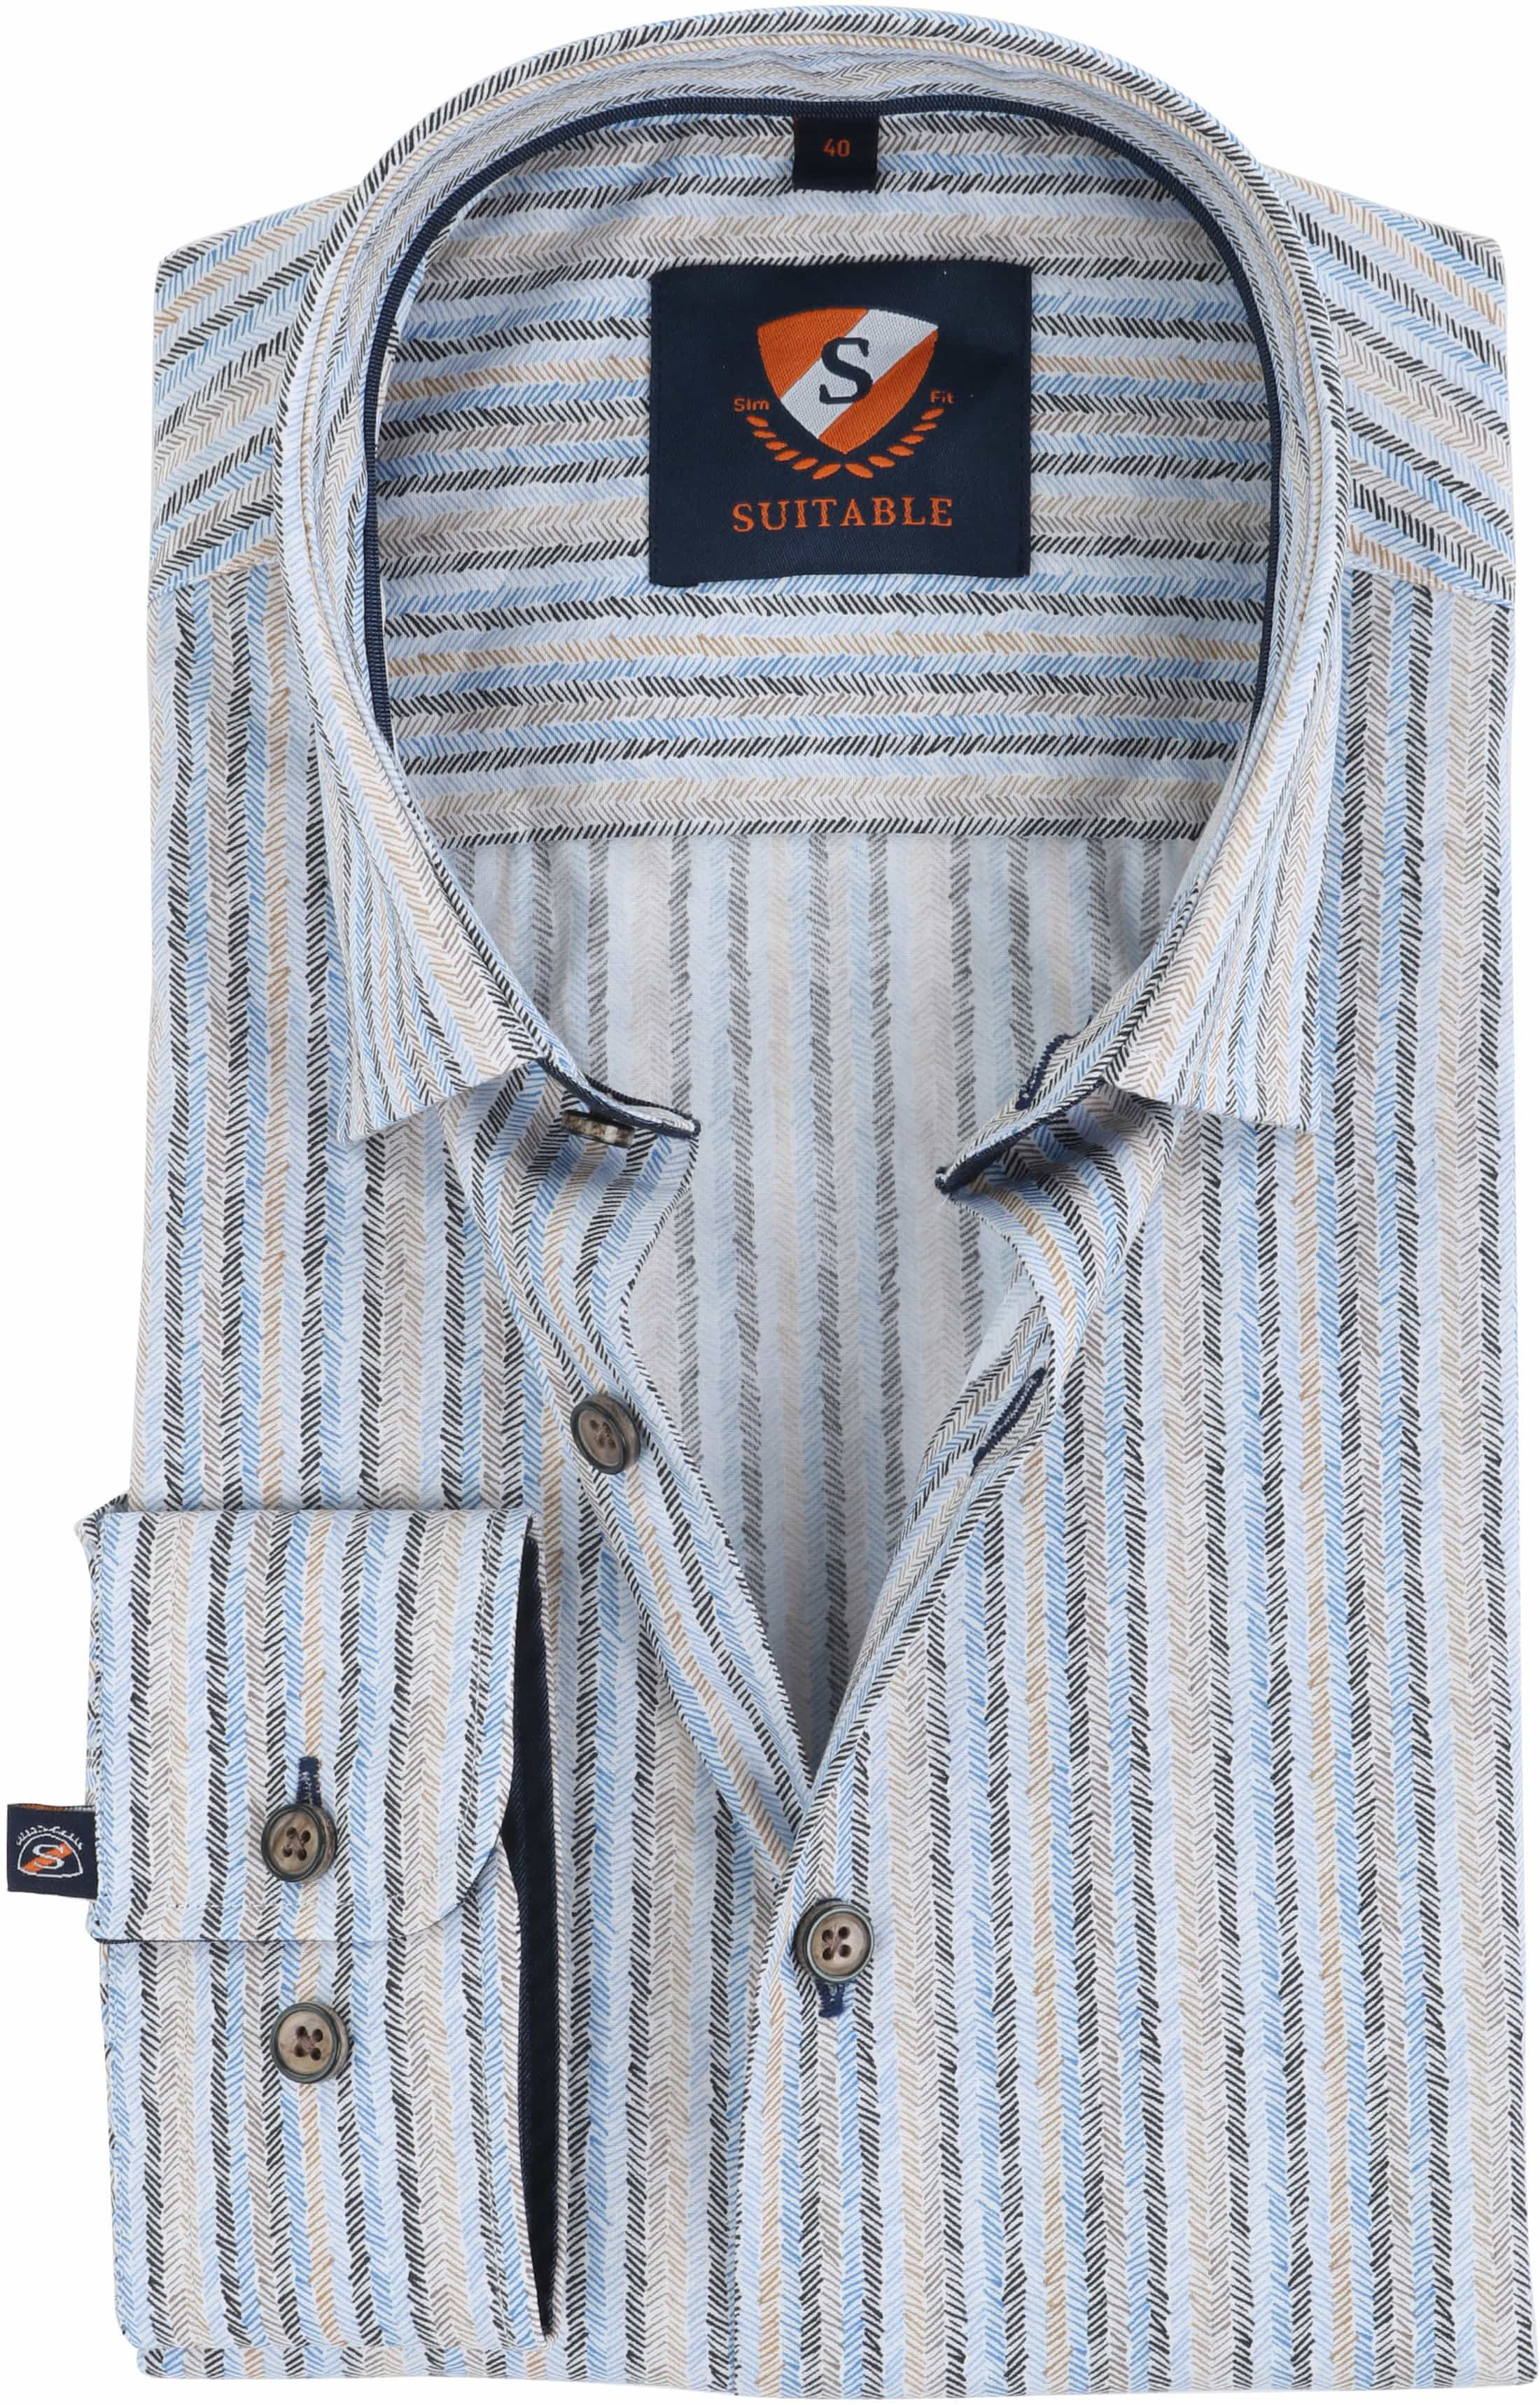 Suitable Overhemd Herring Print HBD foto 0